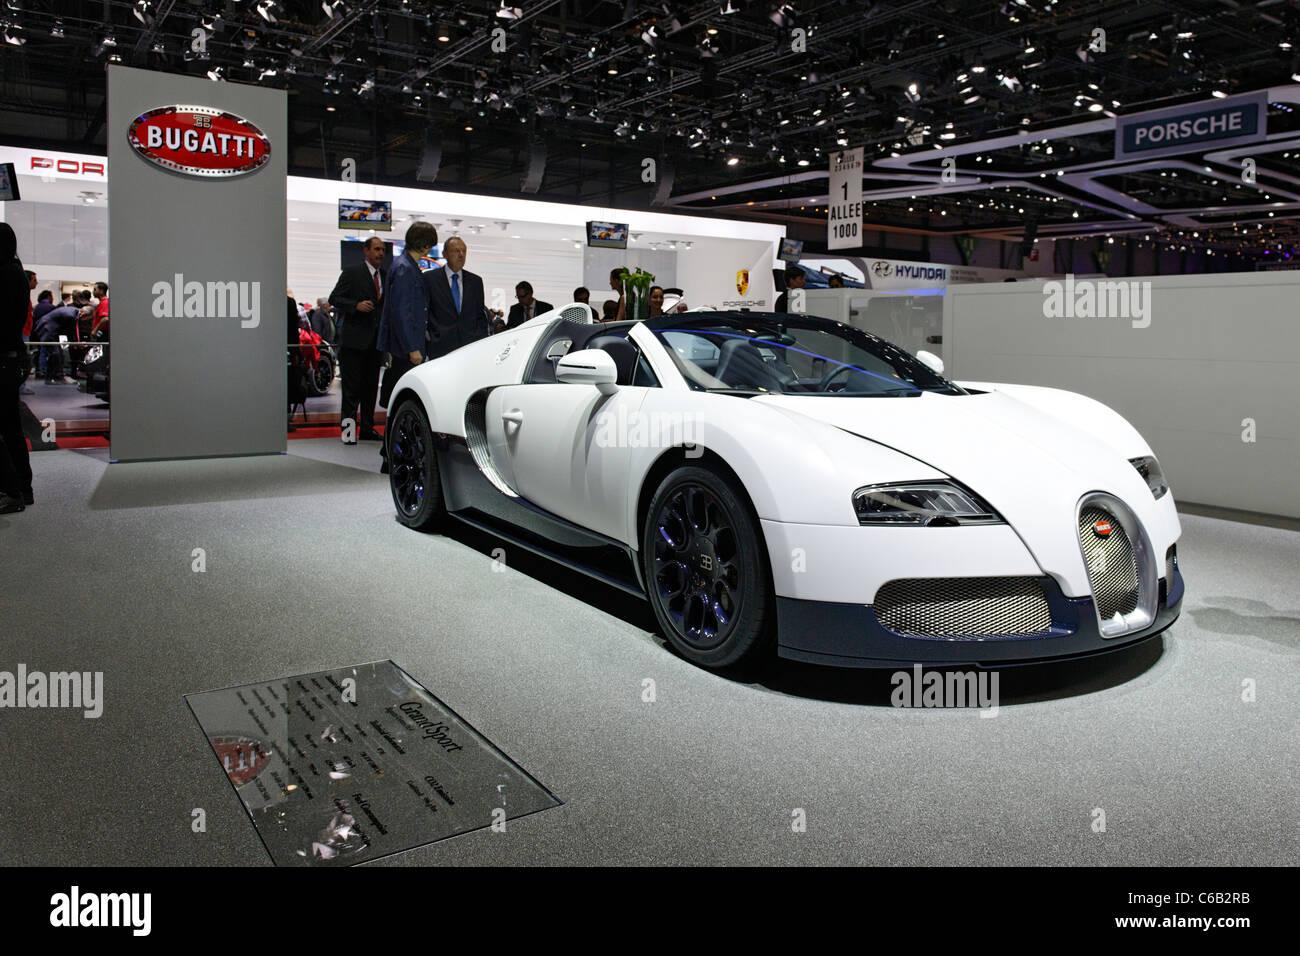 Bugatti Veyron 16.4 Grand Sport, Luxury Sports Car, International Motor  Show Geneva 2011,